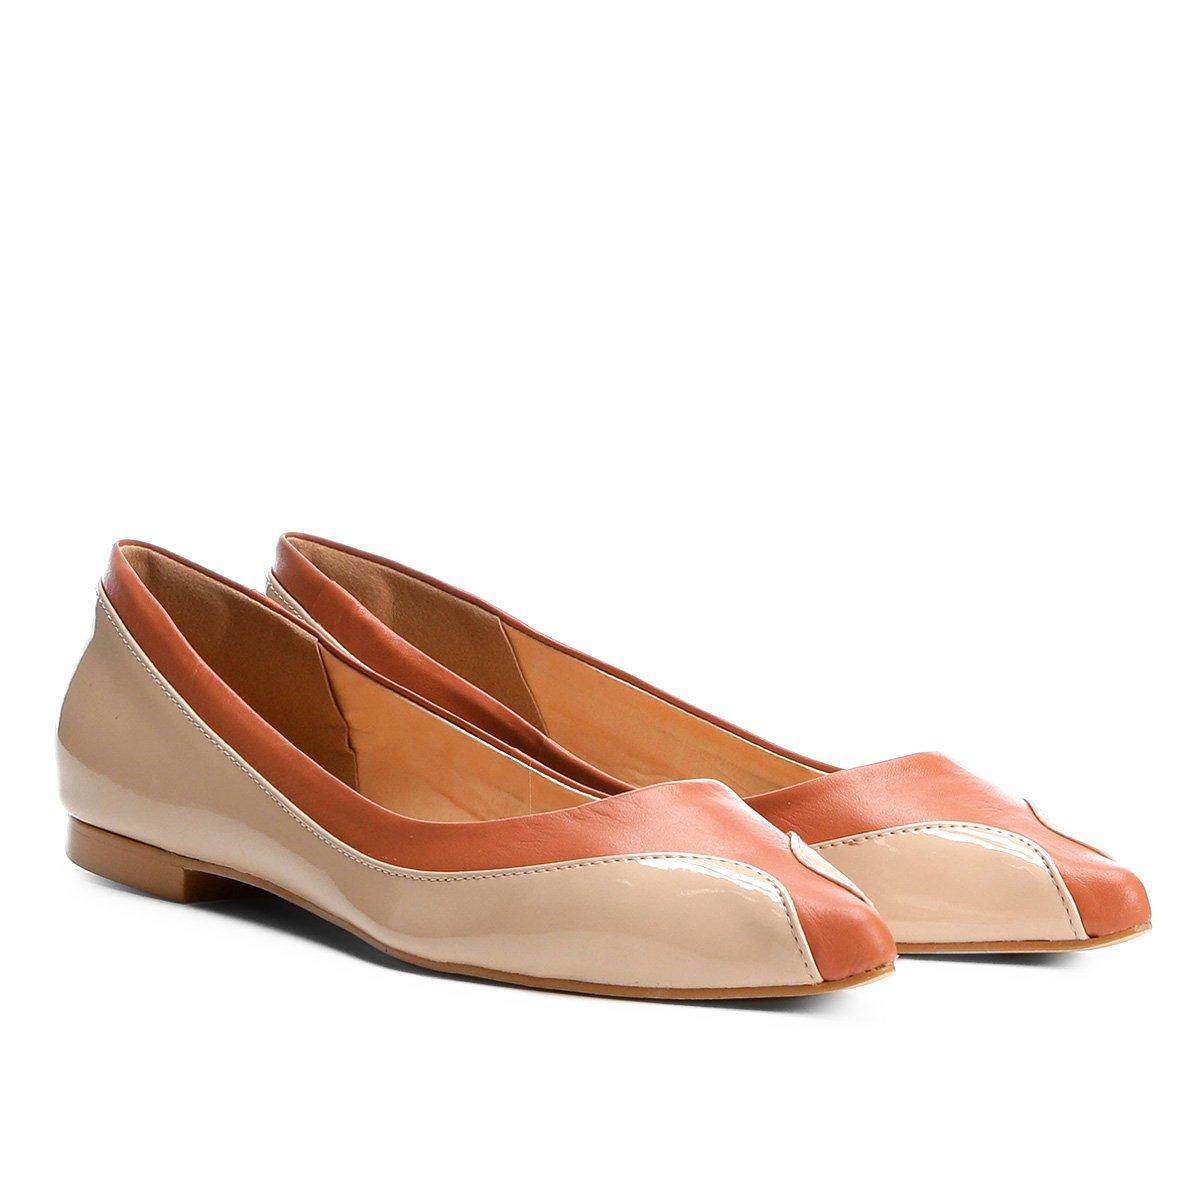 Redondo Couro Bege Shoestock Ondas Bico e Feminina Sapatilha Marrom 8tqd7wHqx